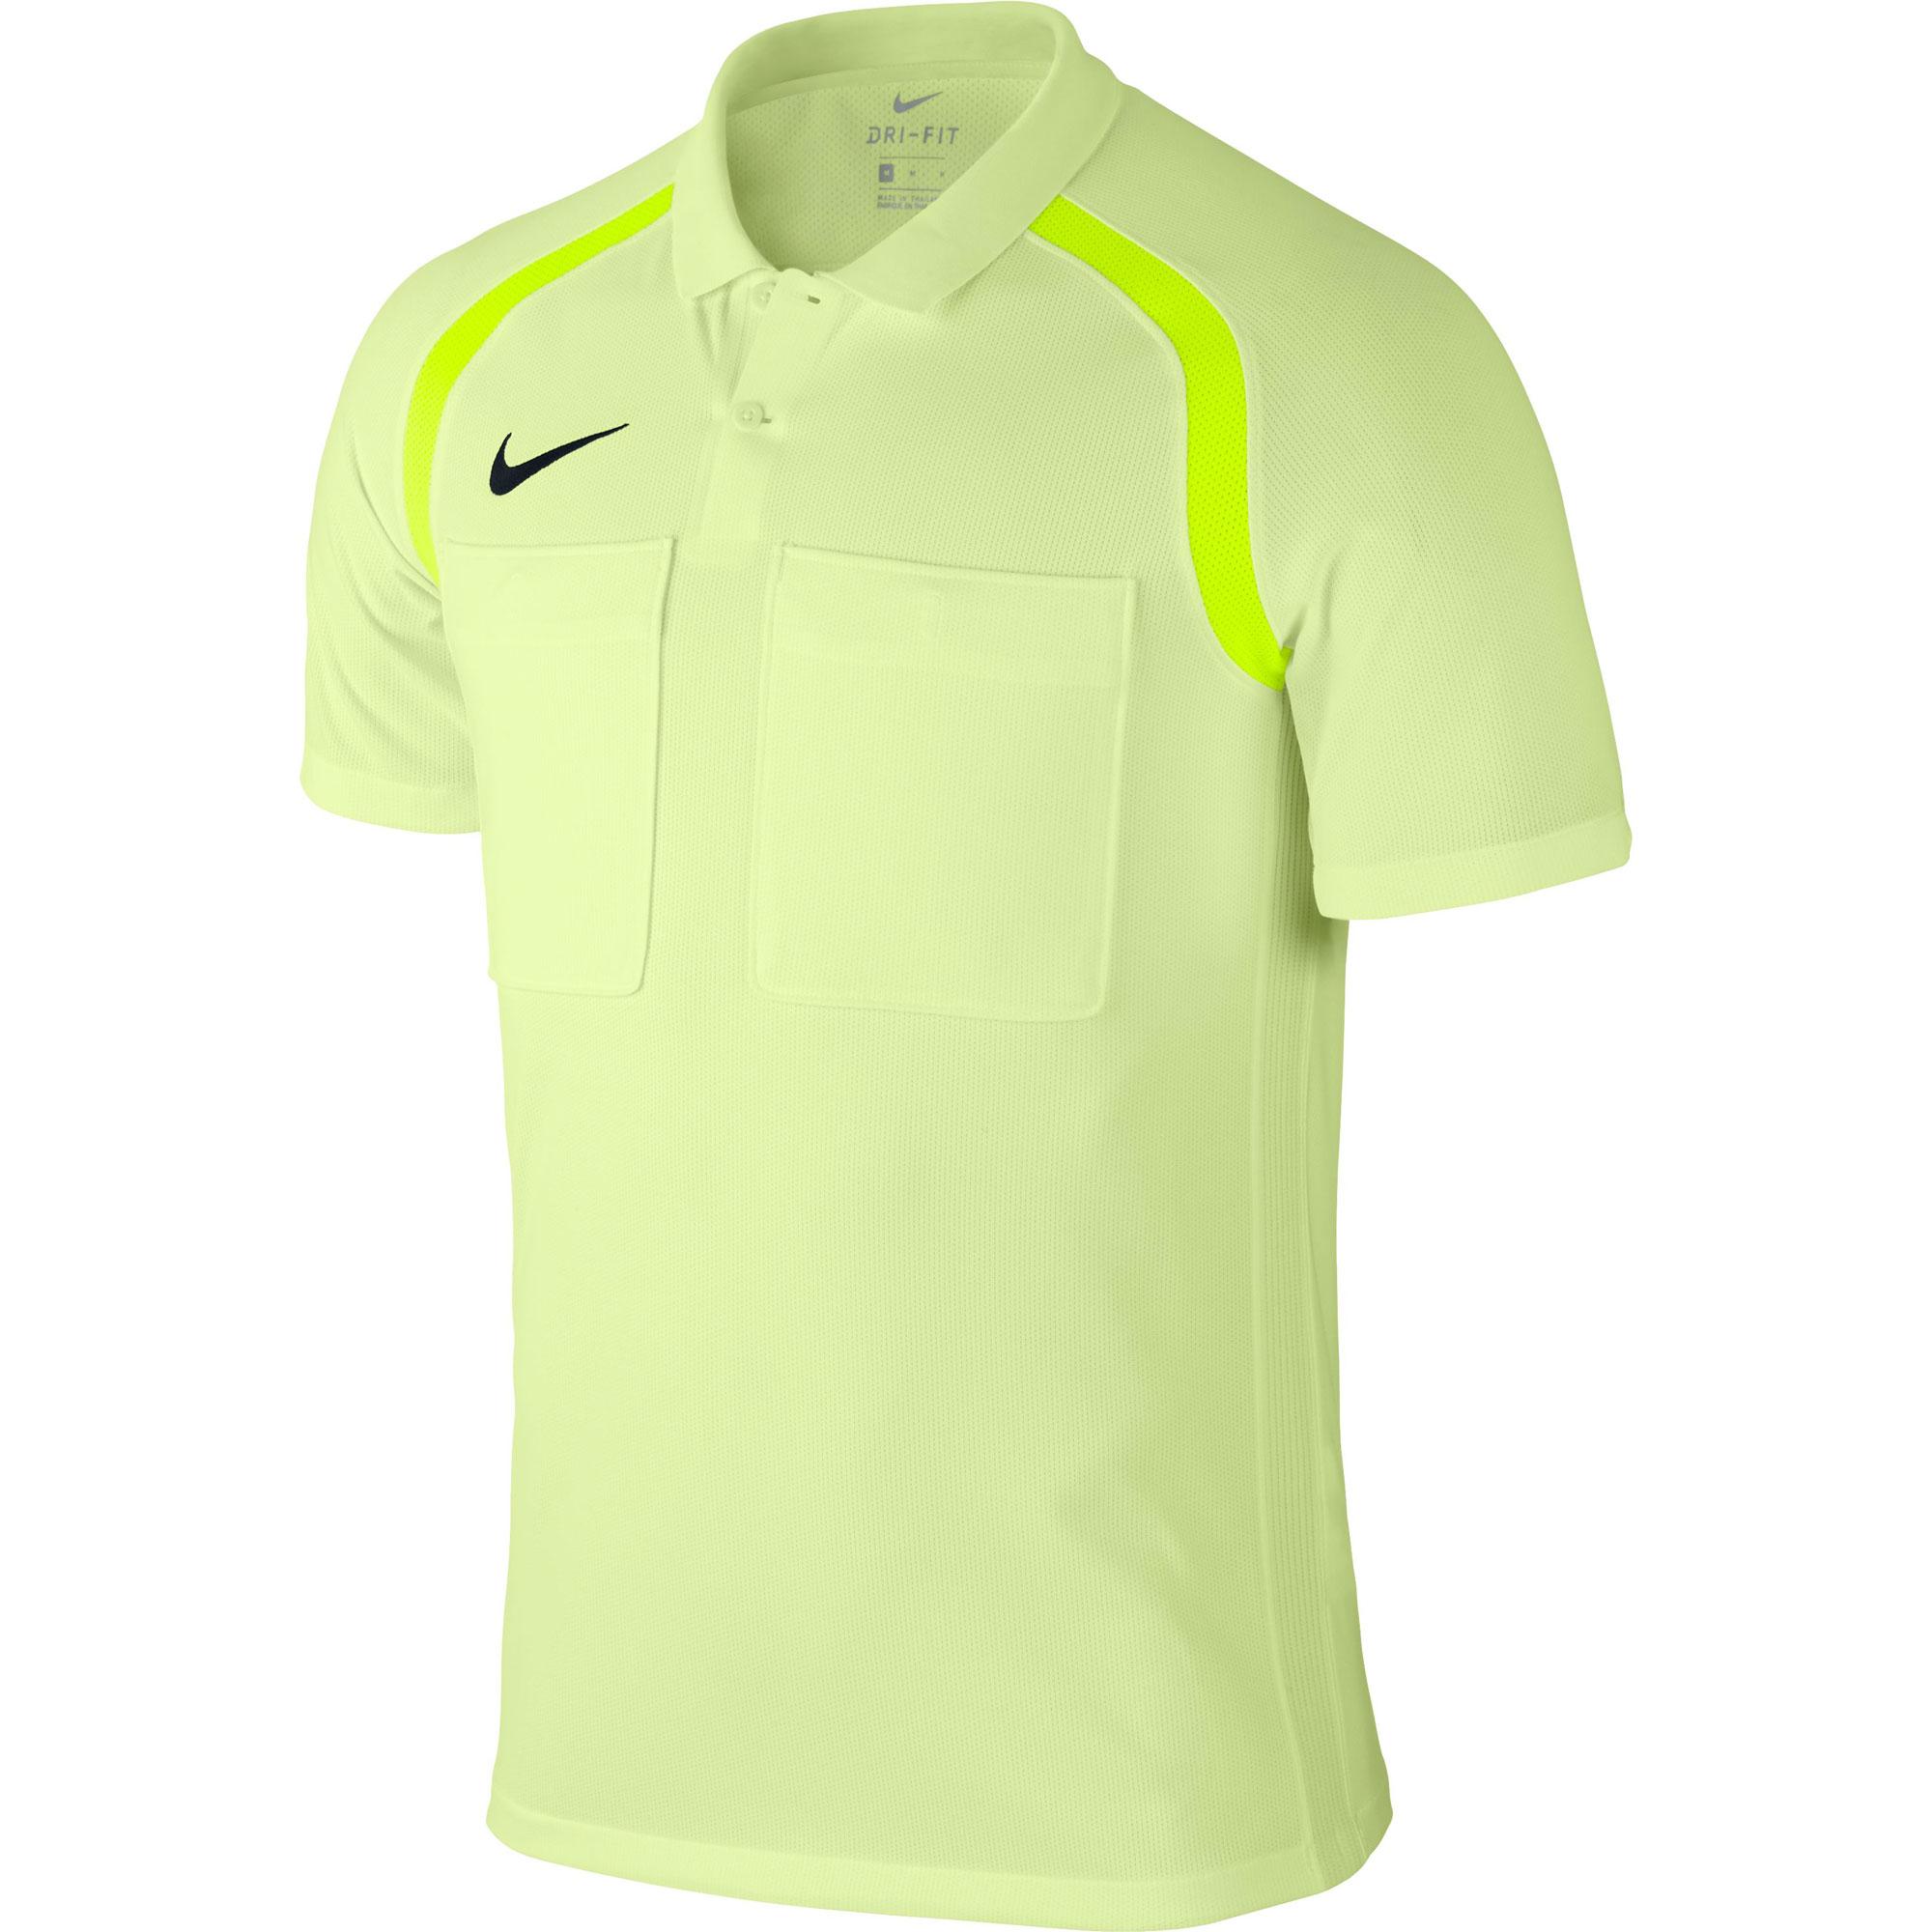 Nike Herren Schiedsrichter Trikot Team Referee Jersey 807703-701 XXL